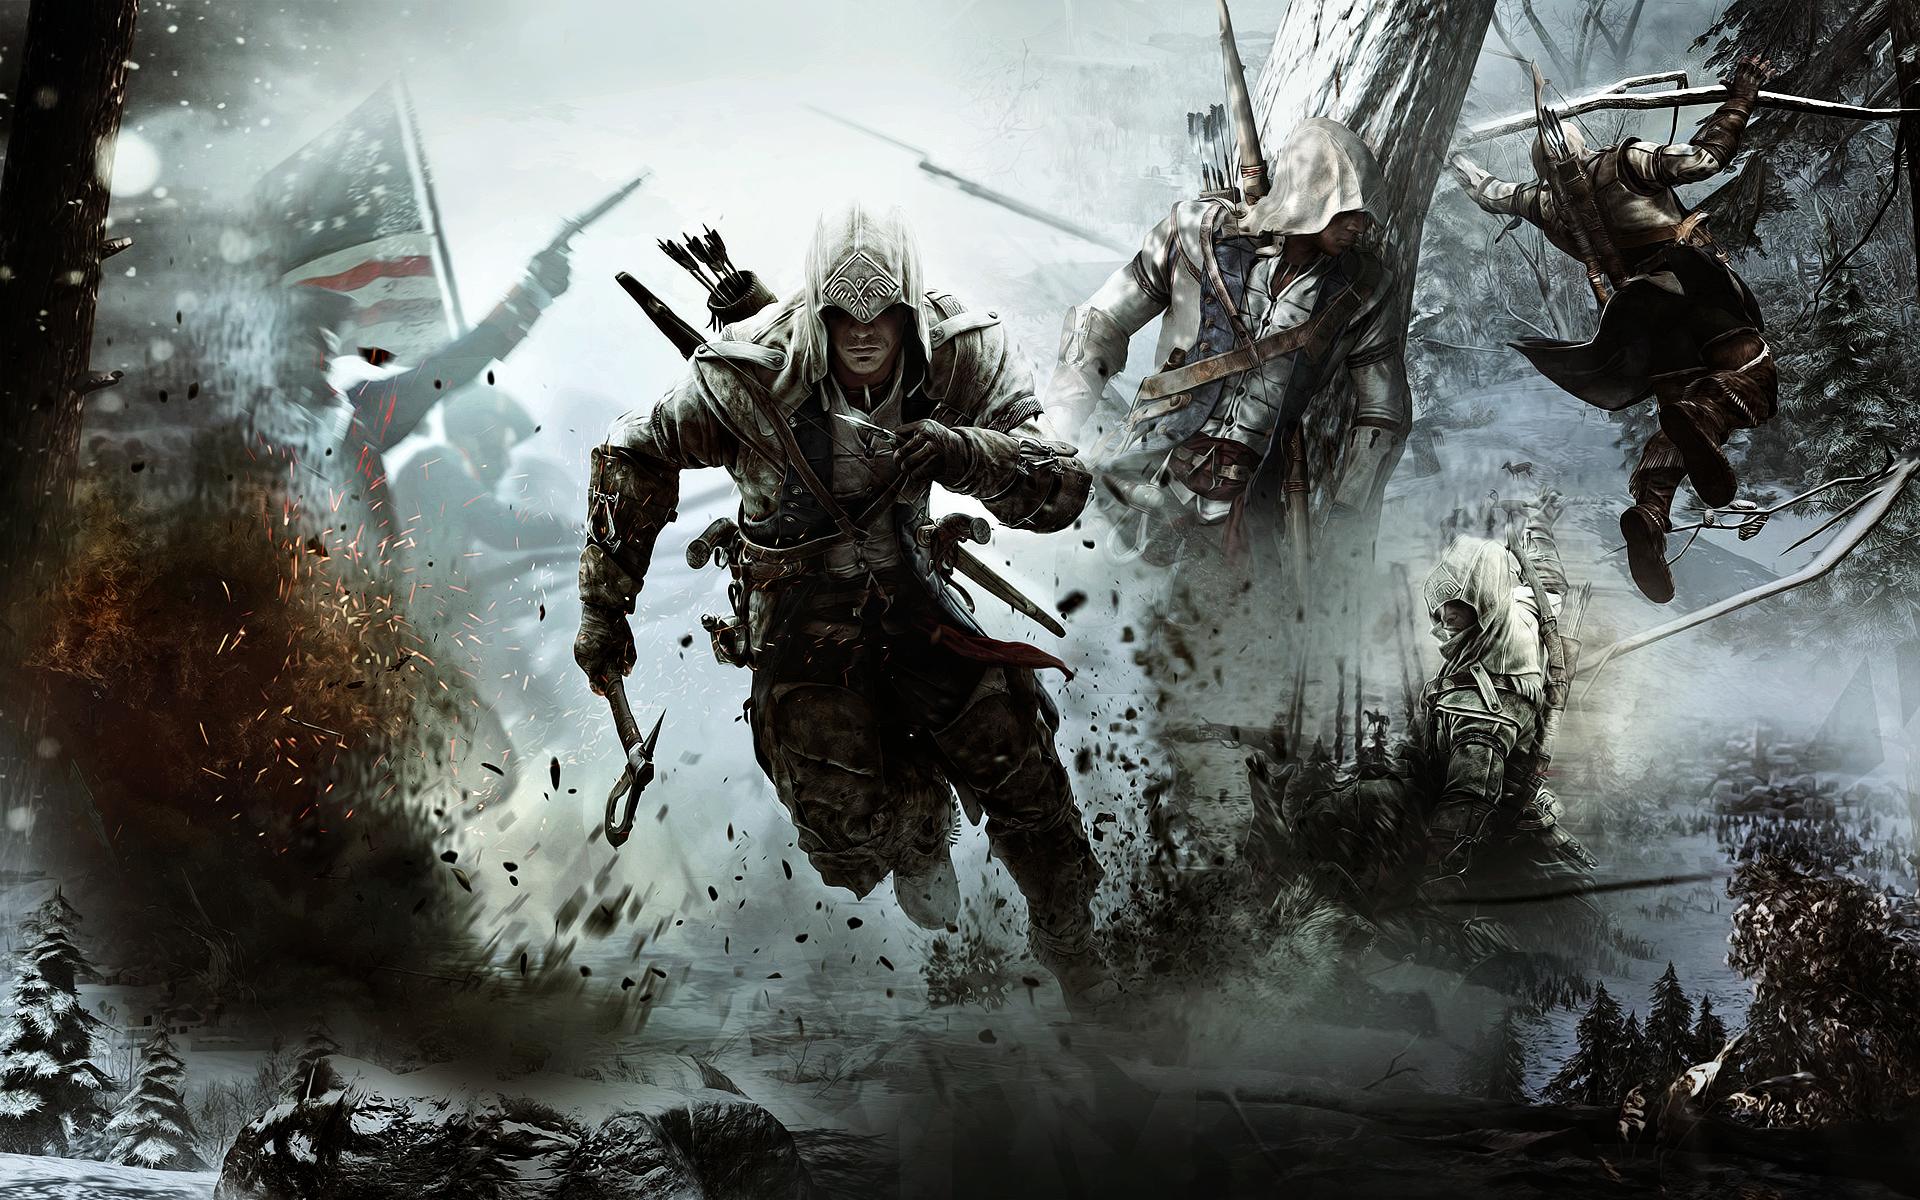 Assassins Creed III Wallpaper Wallpupcom 1920x1200